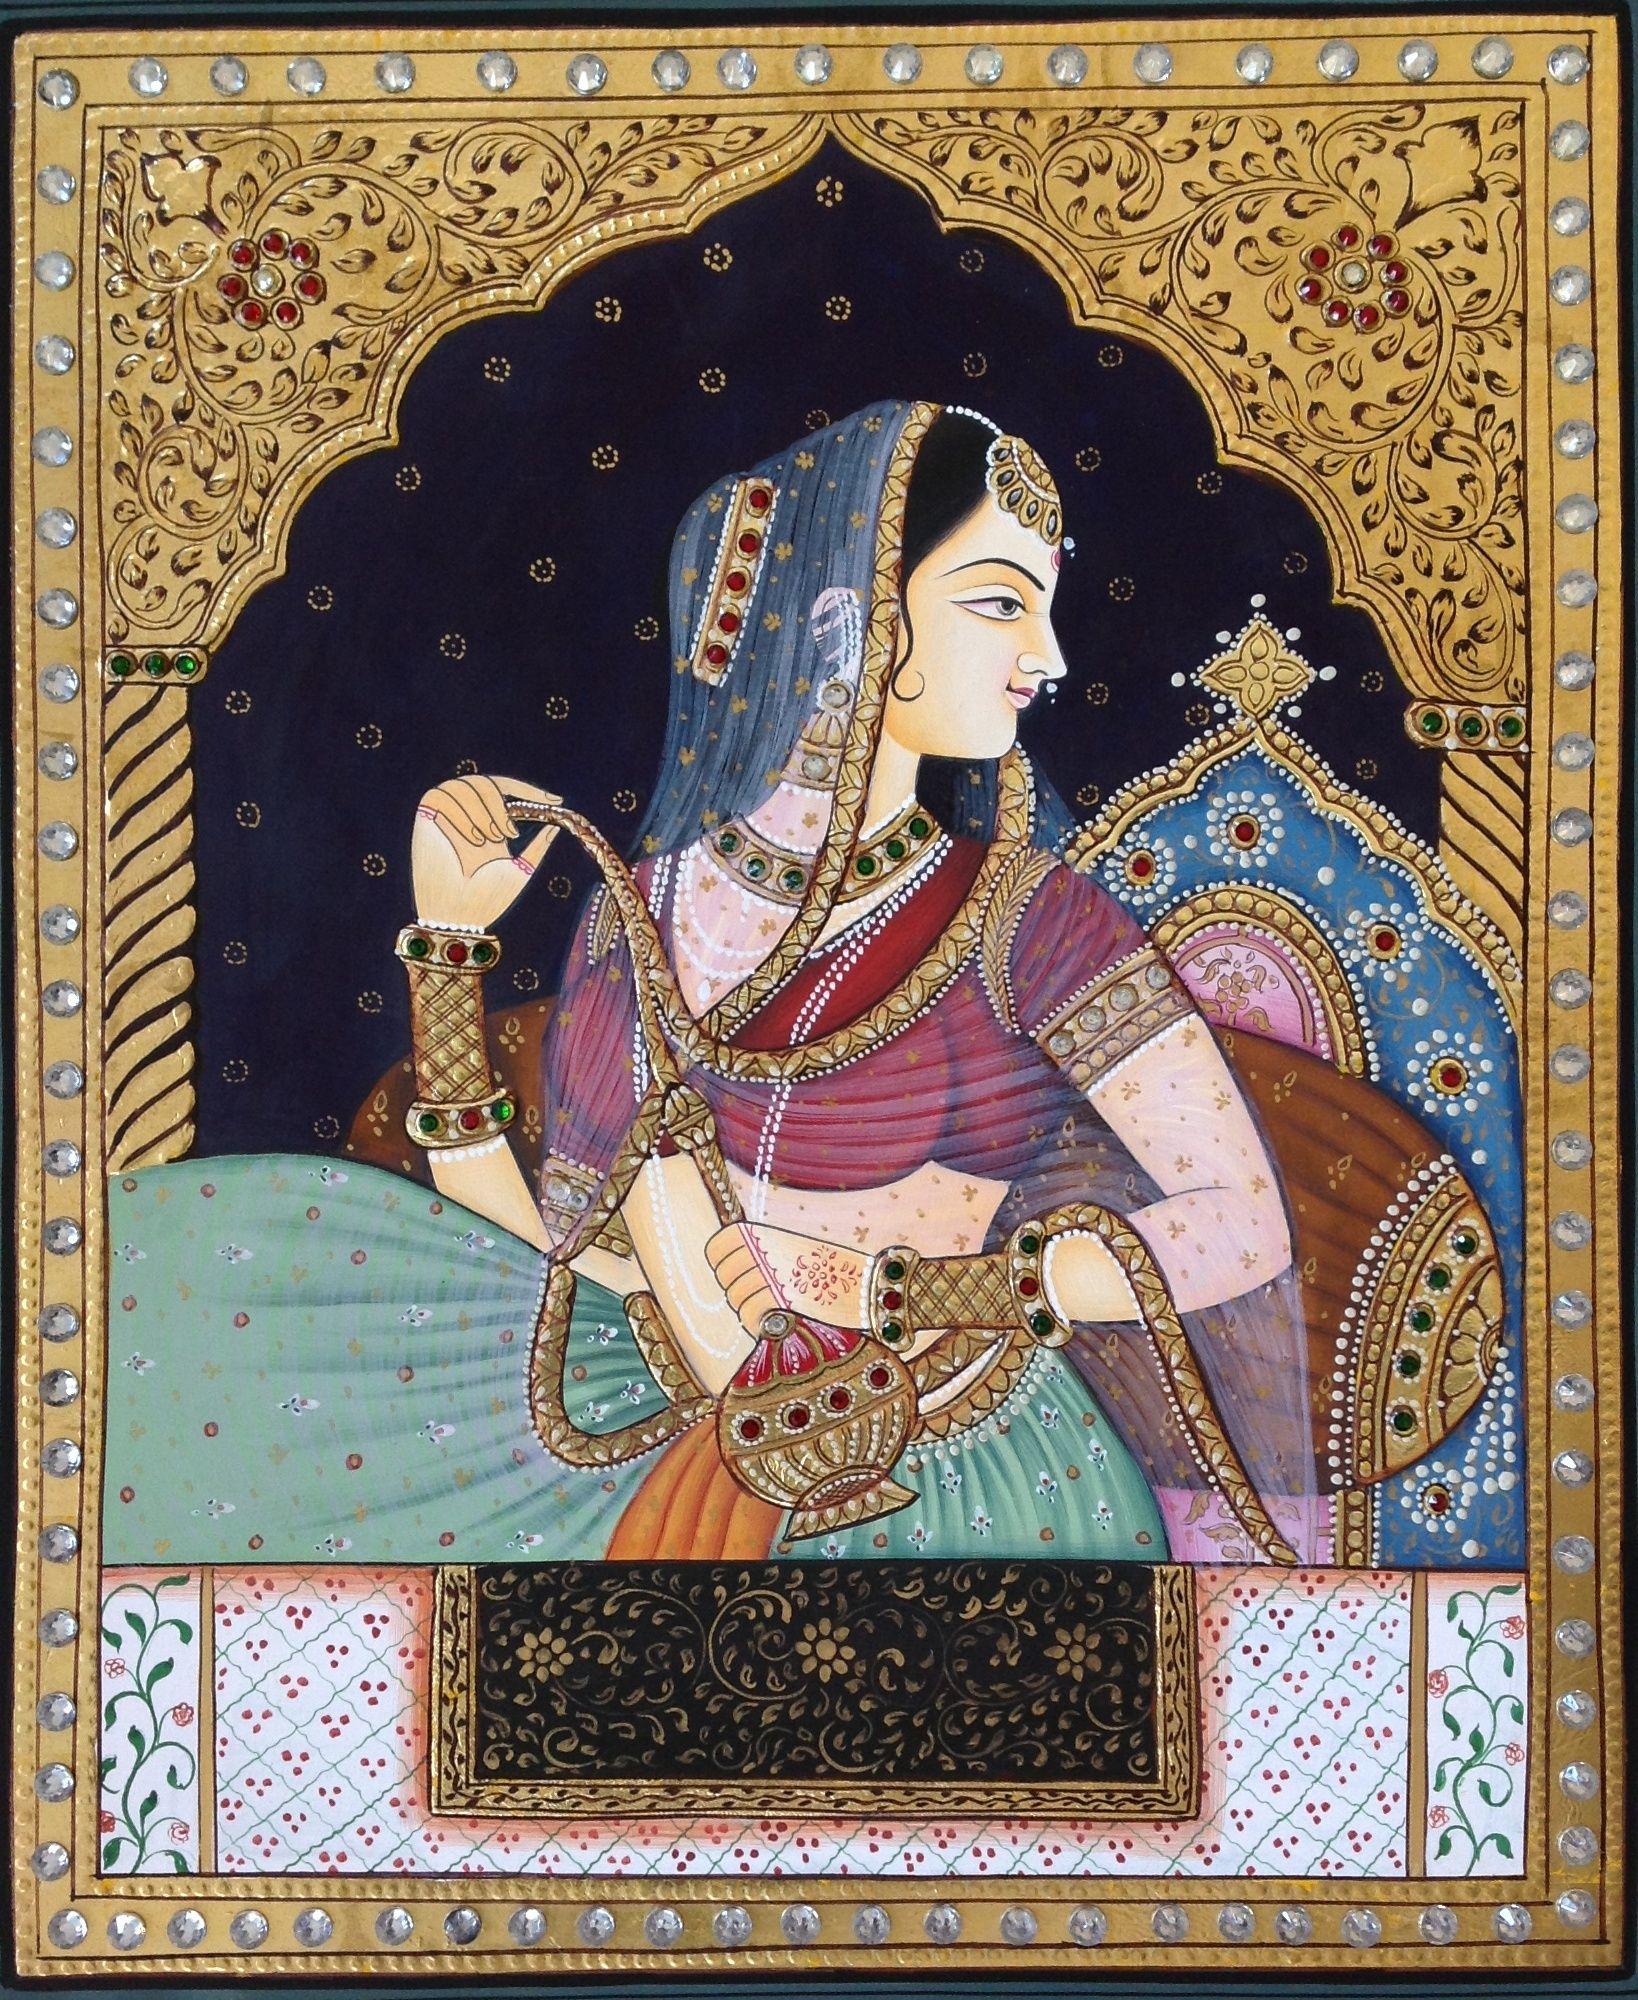 Tanjore Rajasthani Rani Art Handmade Indian Thanjavur Wall Decor Gold Painting   Mughal Paintings   Persian Miniatures   Rajasthani Art